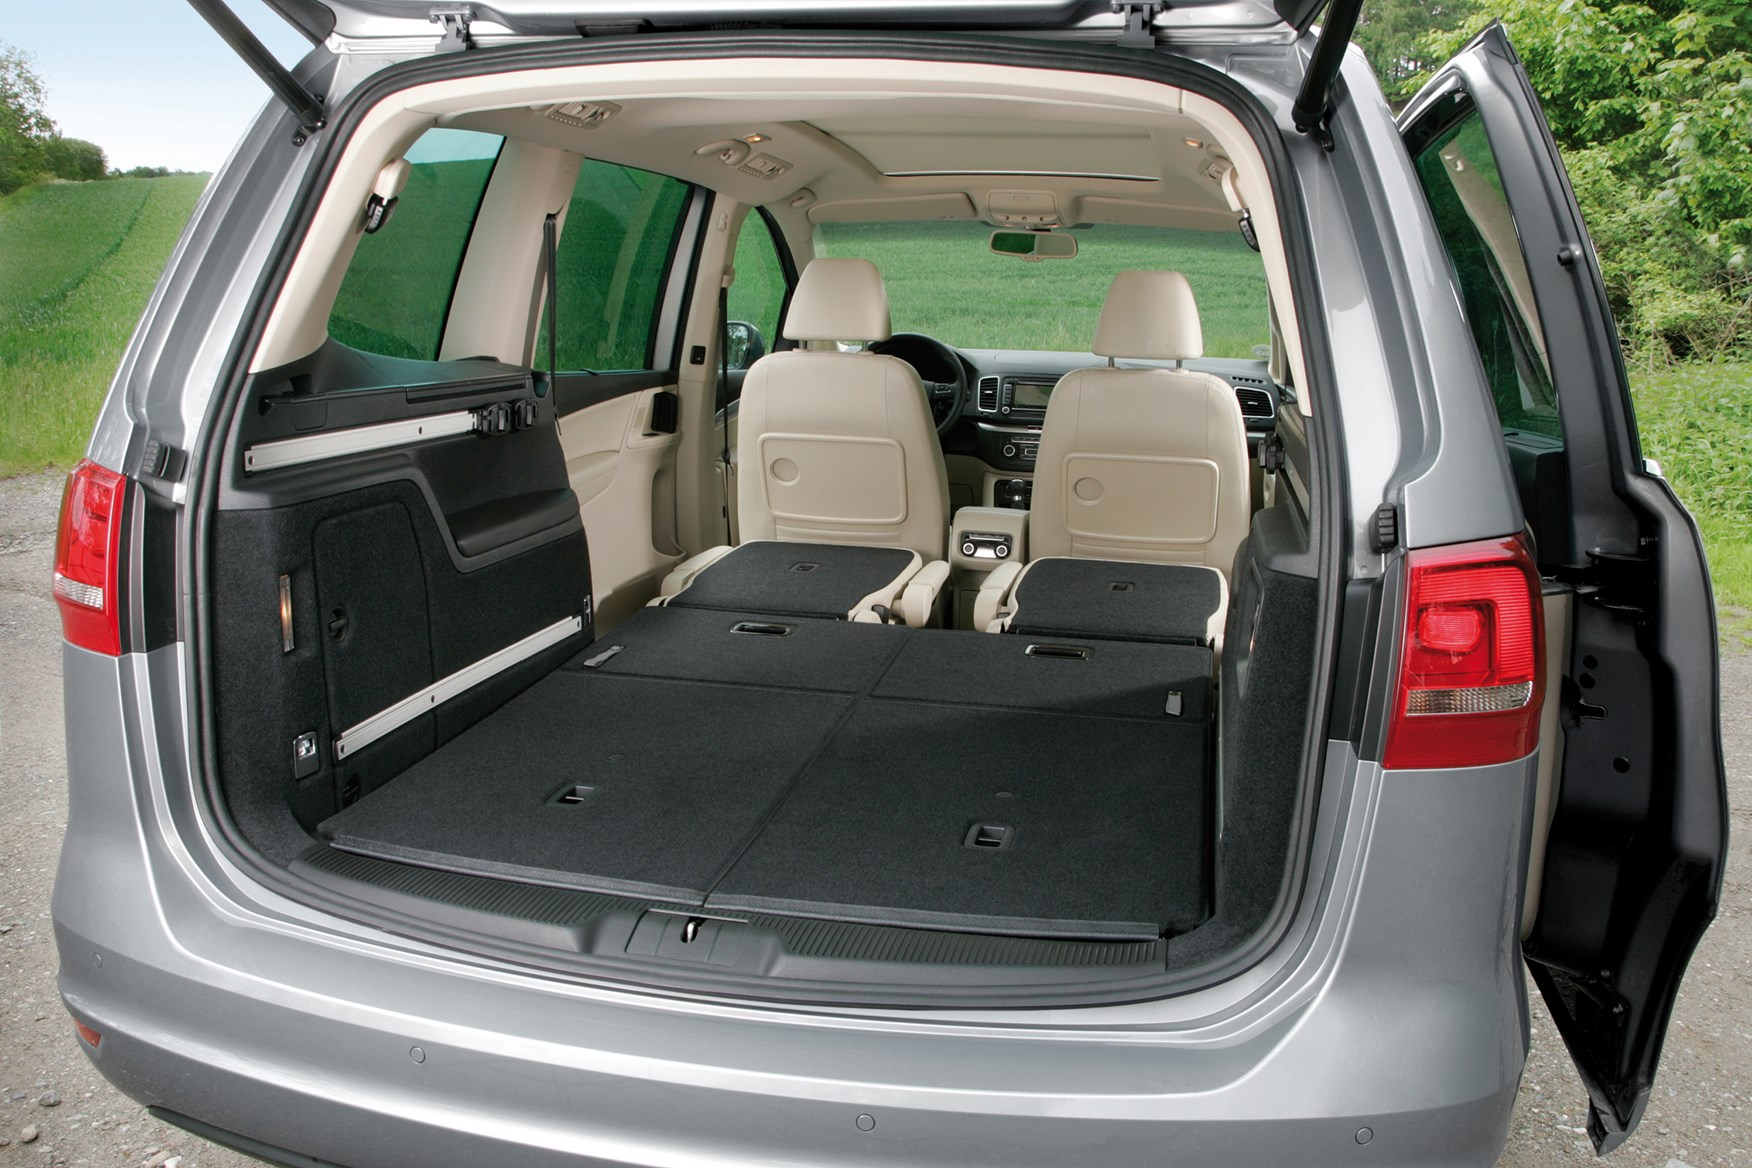 Volkswagen Sharan Estate (2010 - ) Features, Equipment and ...